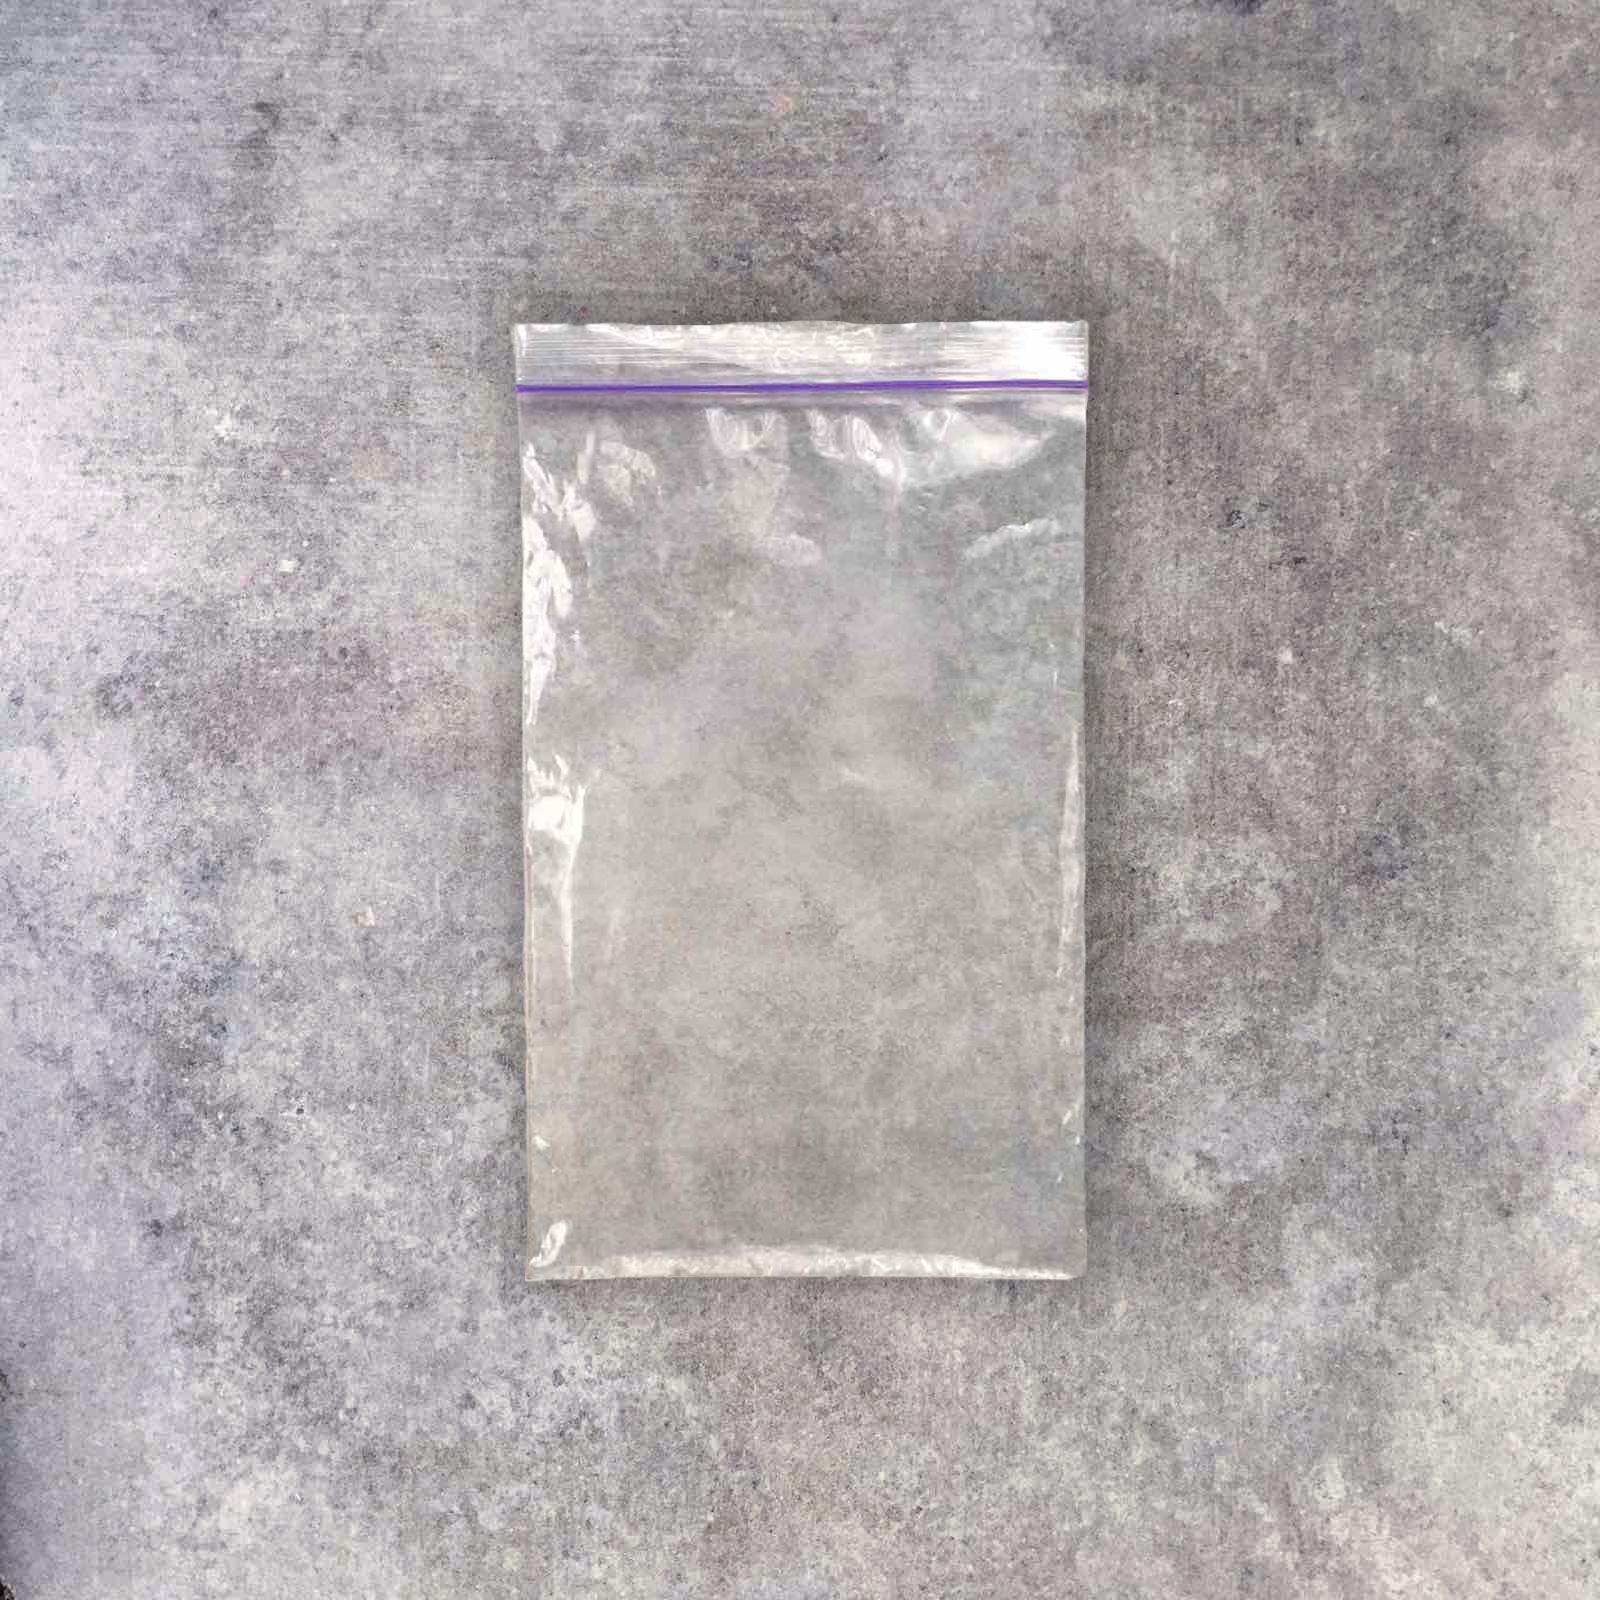 Zip-lock plastic bag